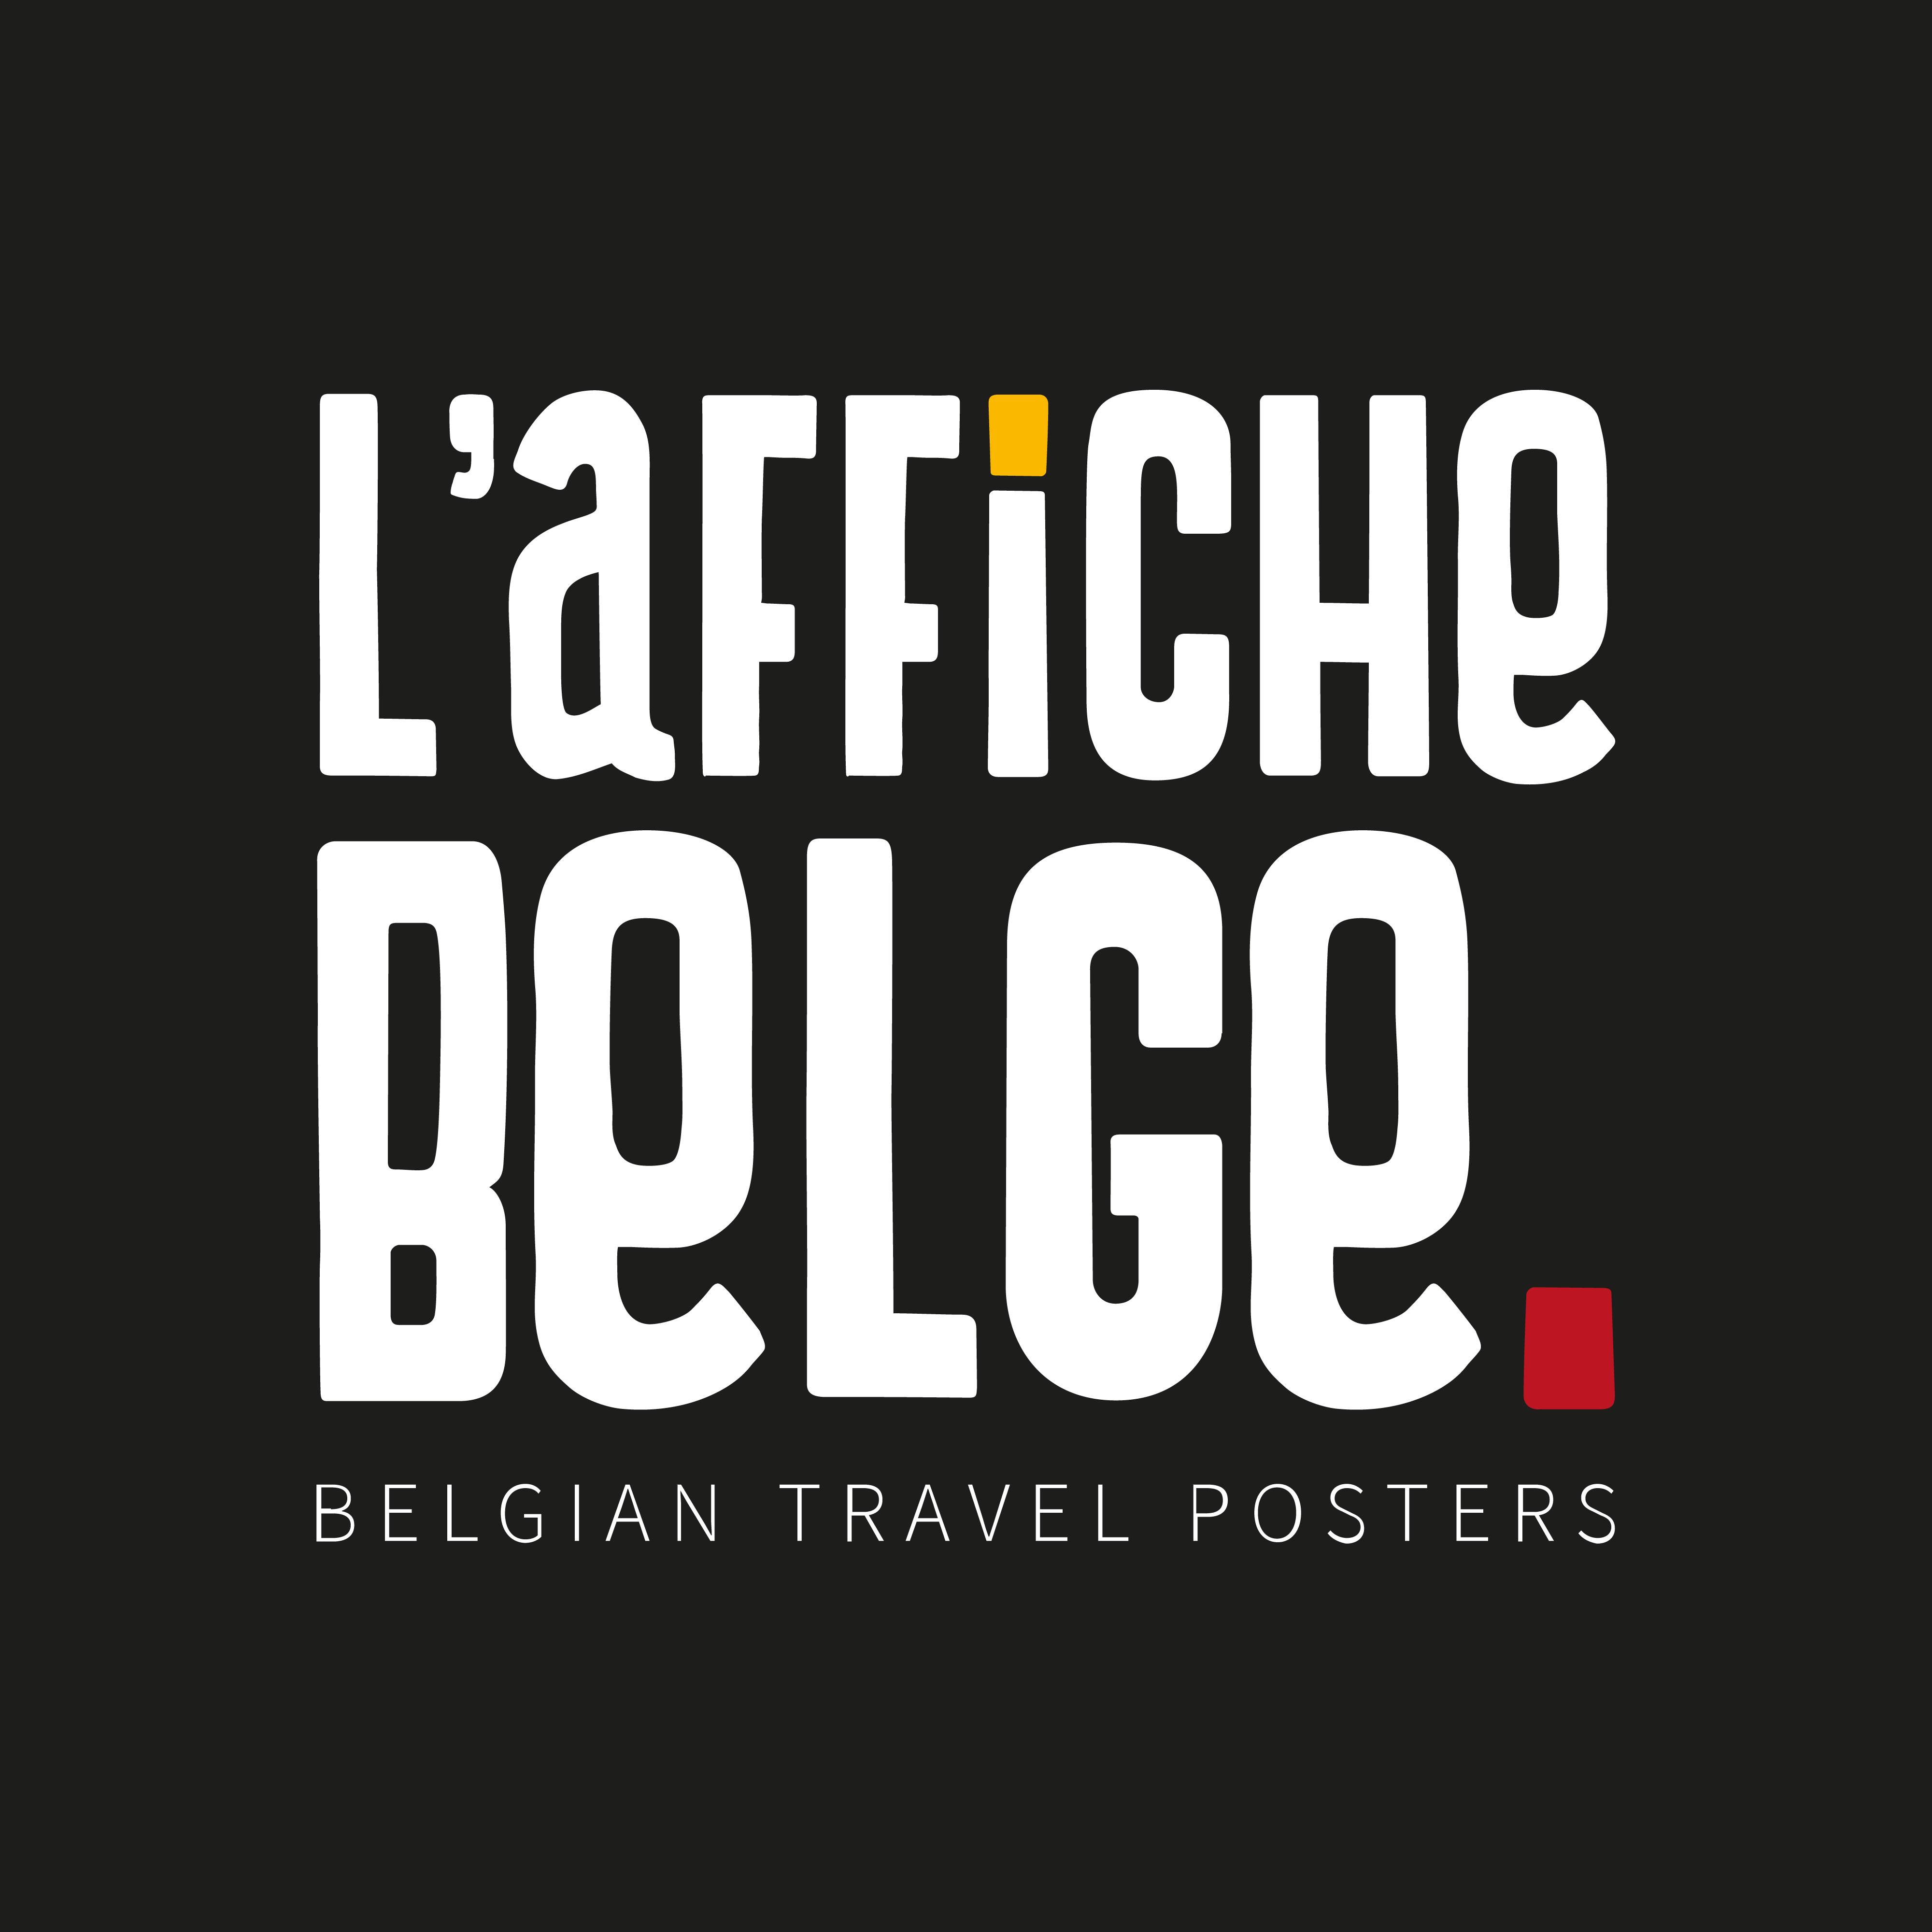 L'Affiche Belge